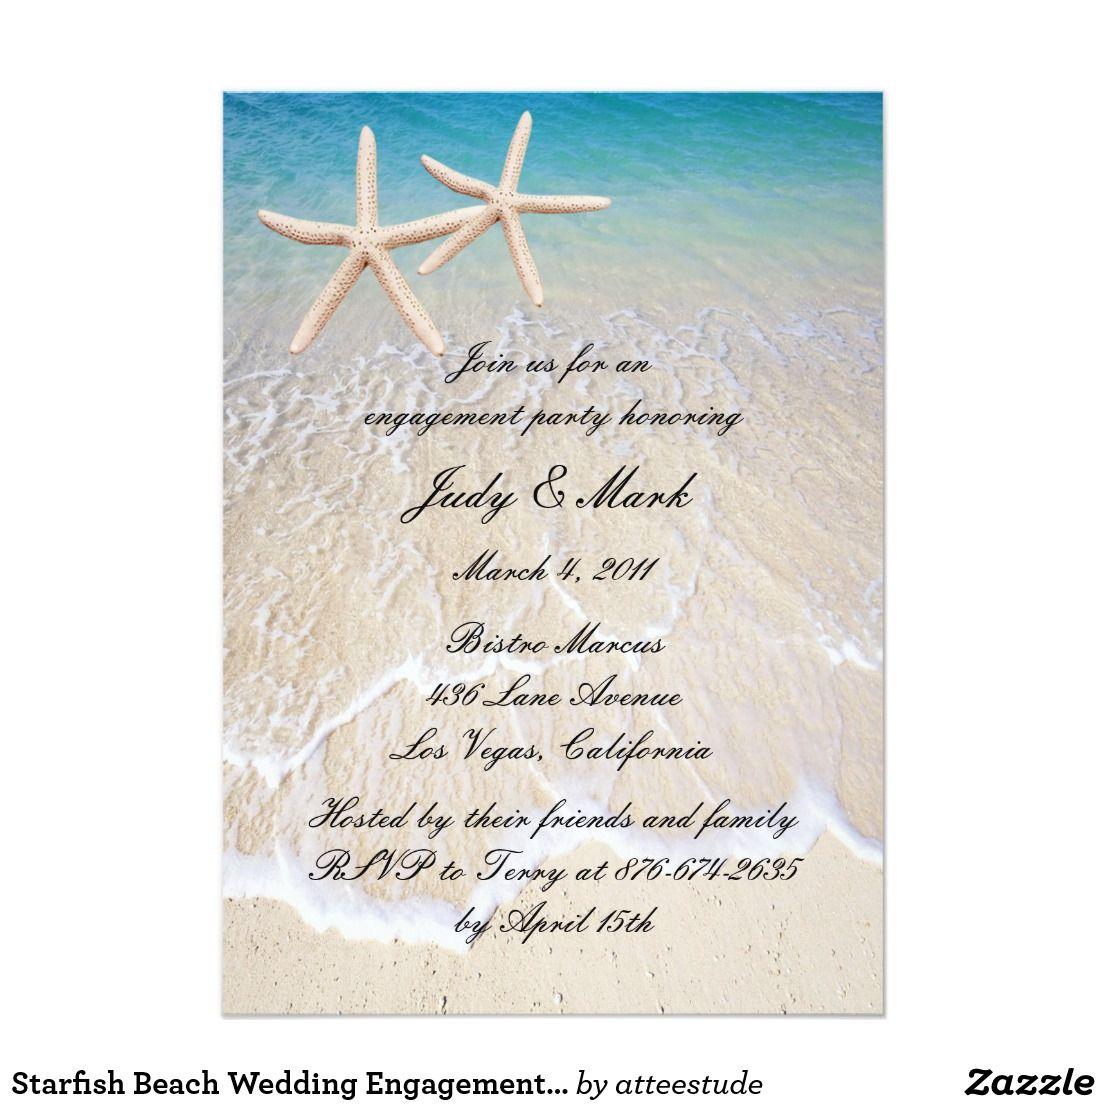 Starfish Beach Wedding Engagement Party Invitation | Vintage Wedding ...